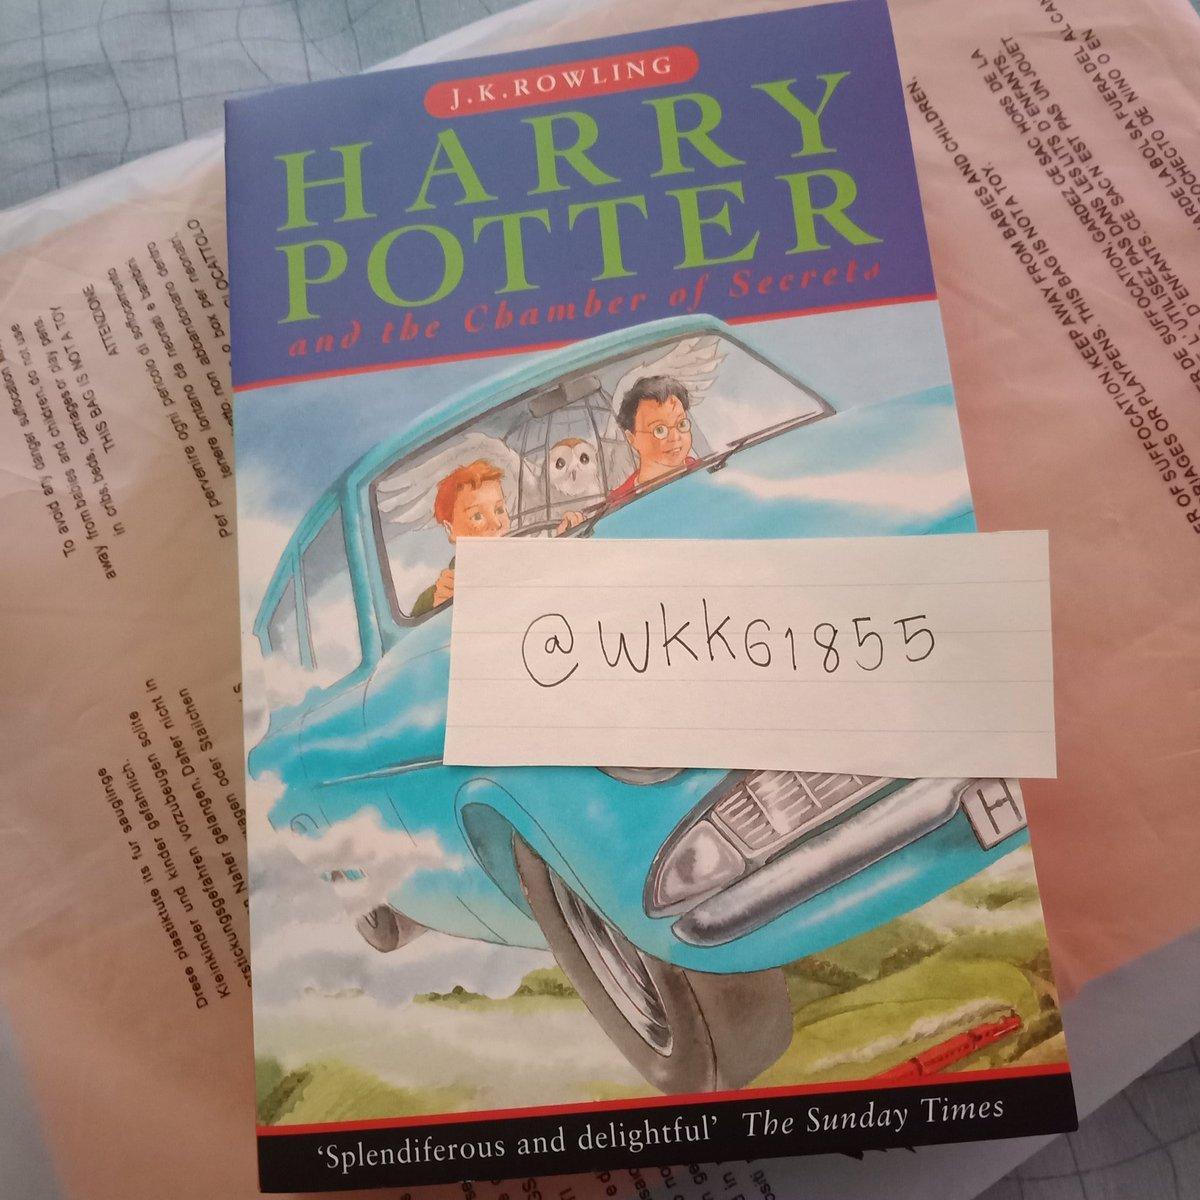 harry potter and the chamber of secrets สภาพดีมาก มีตำหนิที่สันนิดหน่อย ดูรูปเพิ่มเติมได้นะคะ   200 .-   reg 30/ems50 #หนังสือมือสอง #หนังสือมือสองสภาพดี #หนังสือมือสองสภาพดีราคาถูก #หนังสือนิยายมือสอง #หนังสือมือ2 #หนังสือแฮร์รี่พอตเตอร์ #แฮร์รี่พอตเตอร์ https://t.co/YOLHYDpUx9